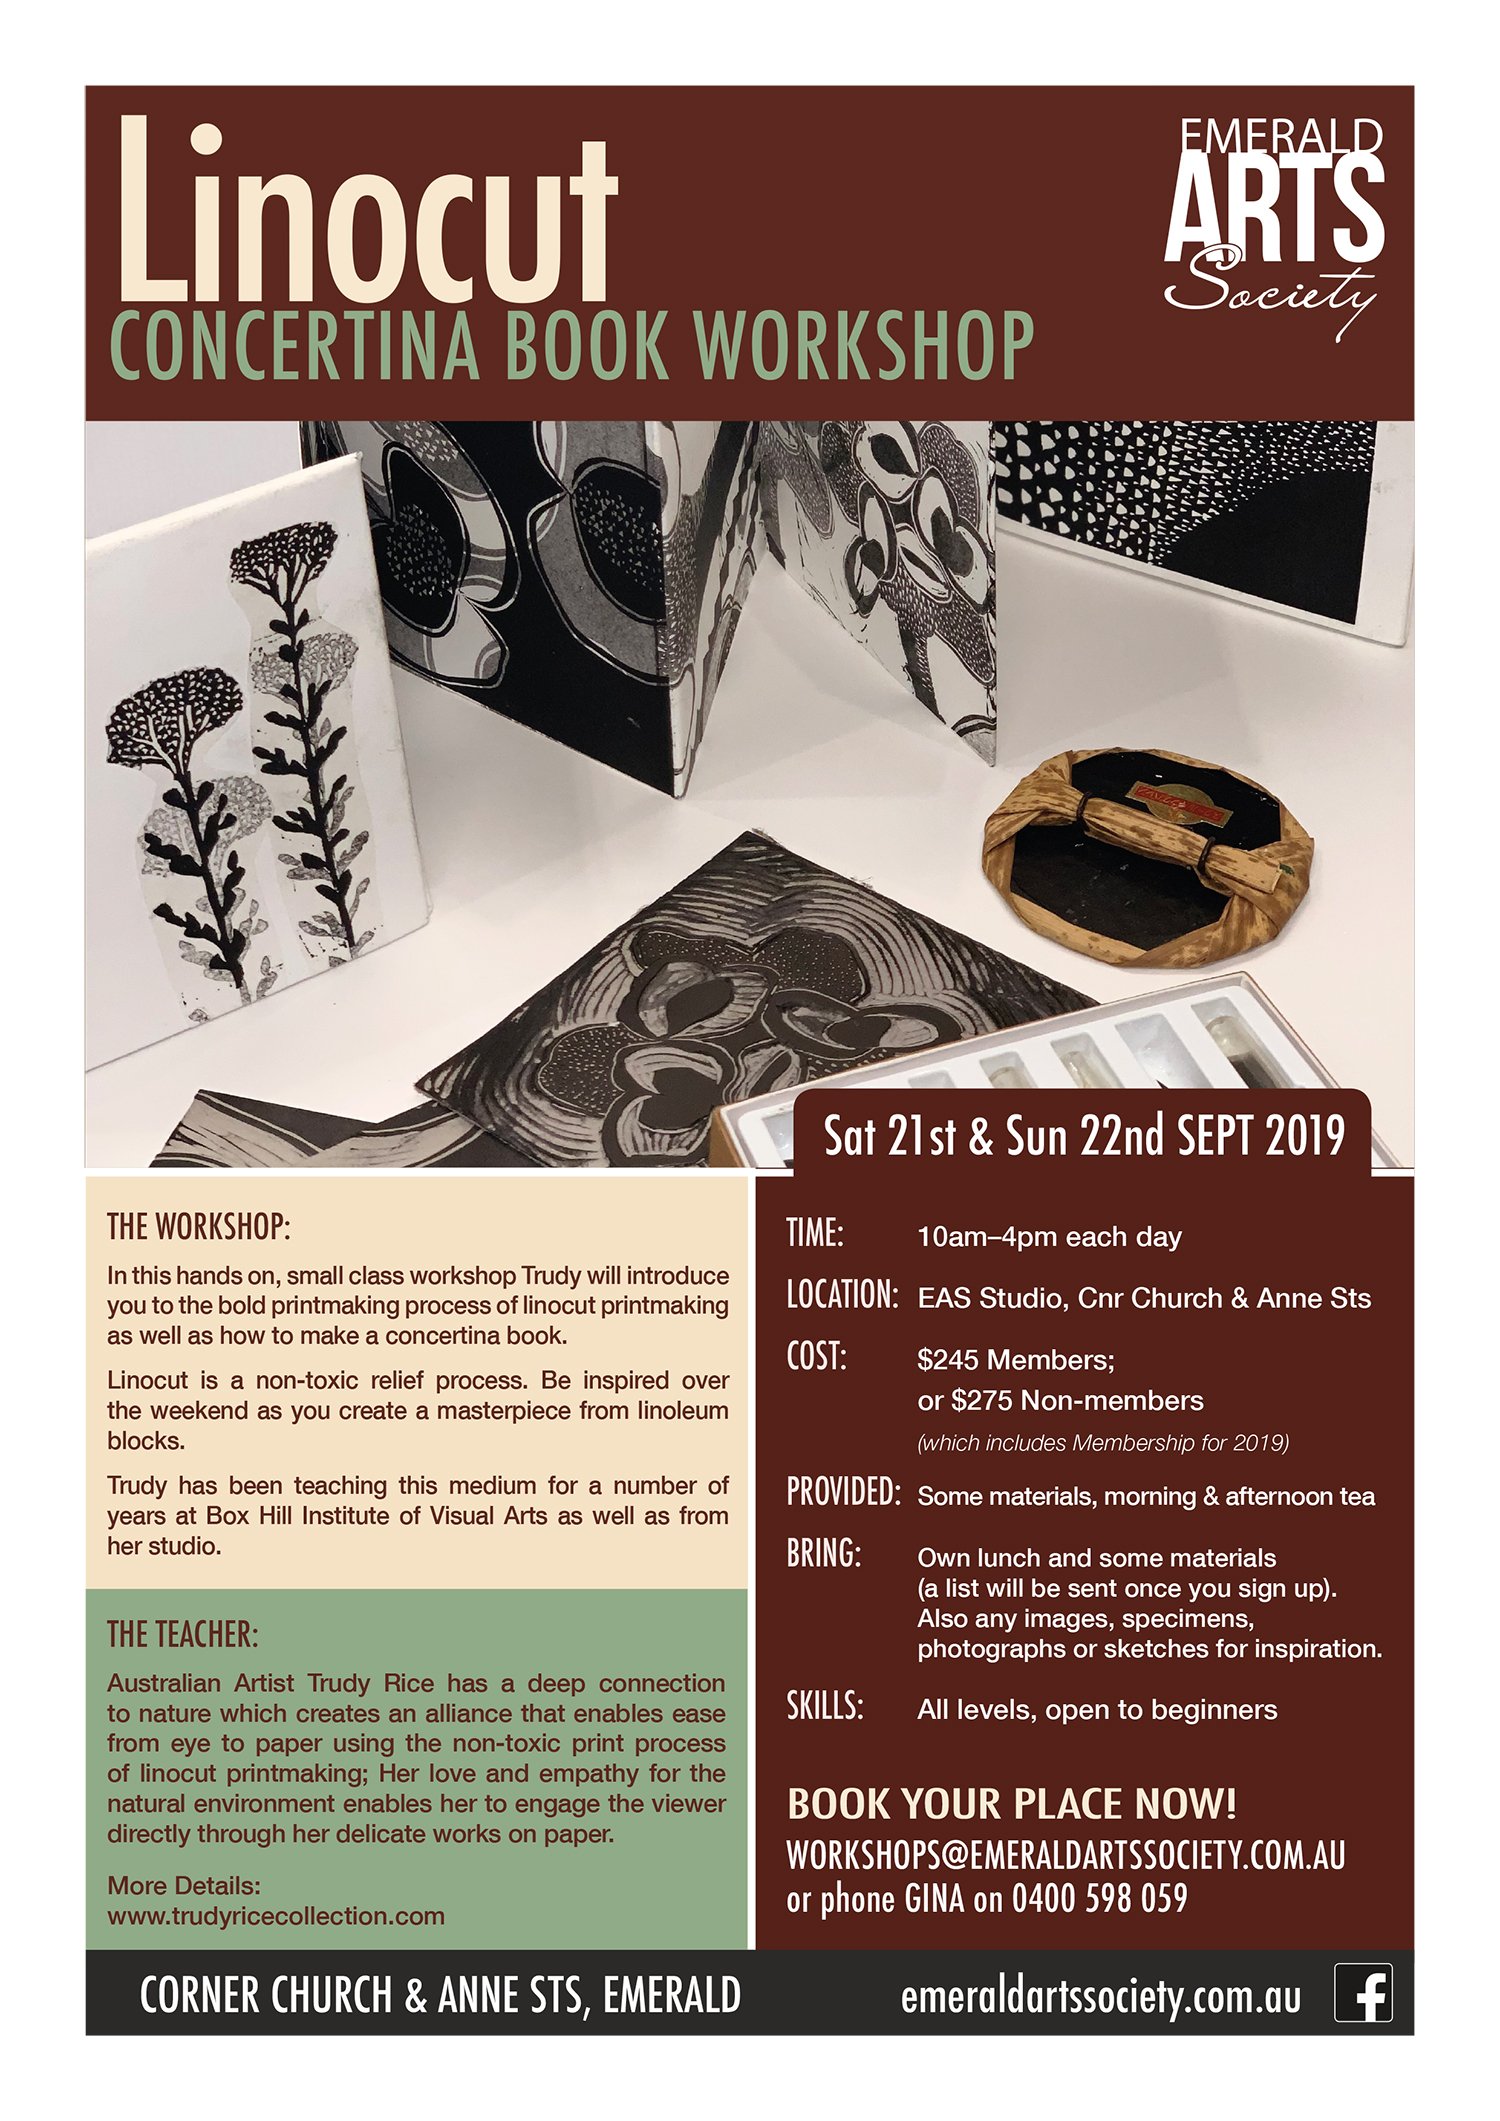 Linocut: Concertina Book Workshop